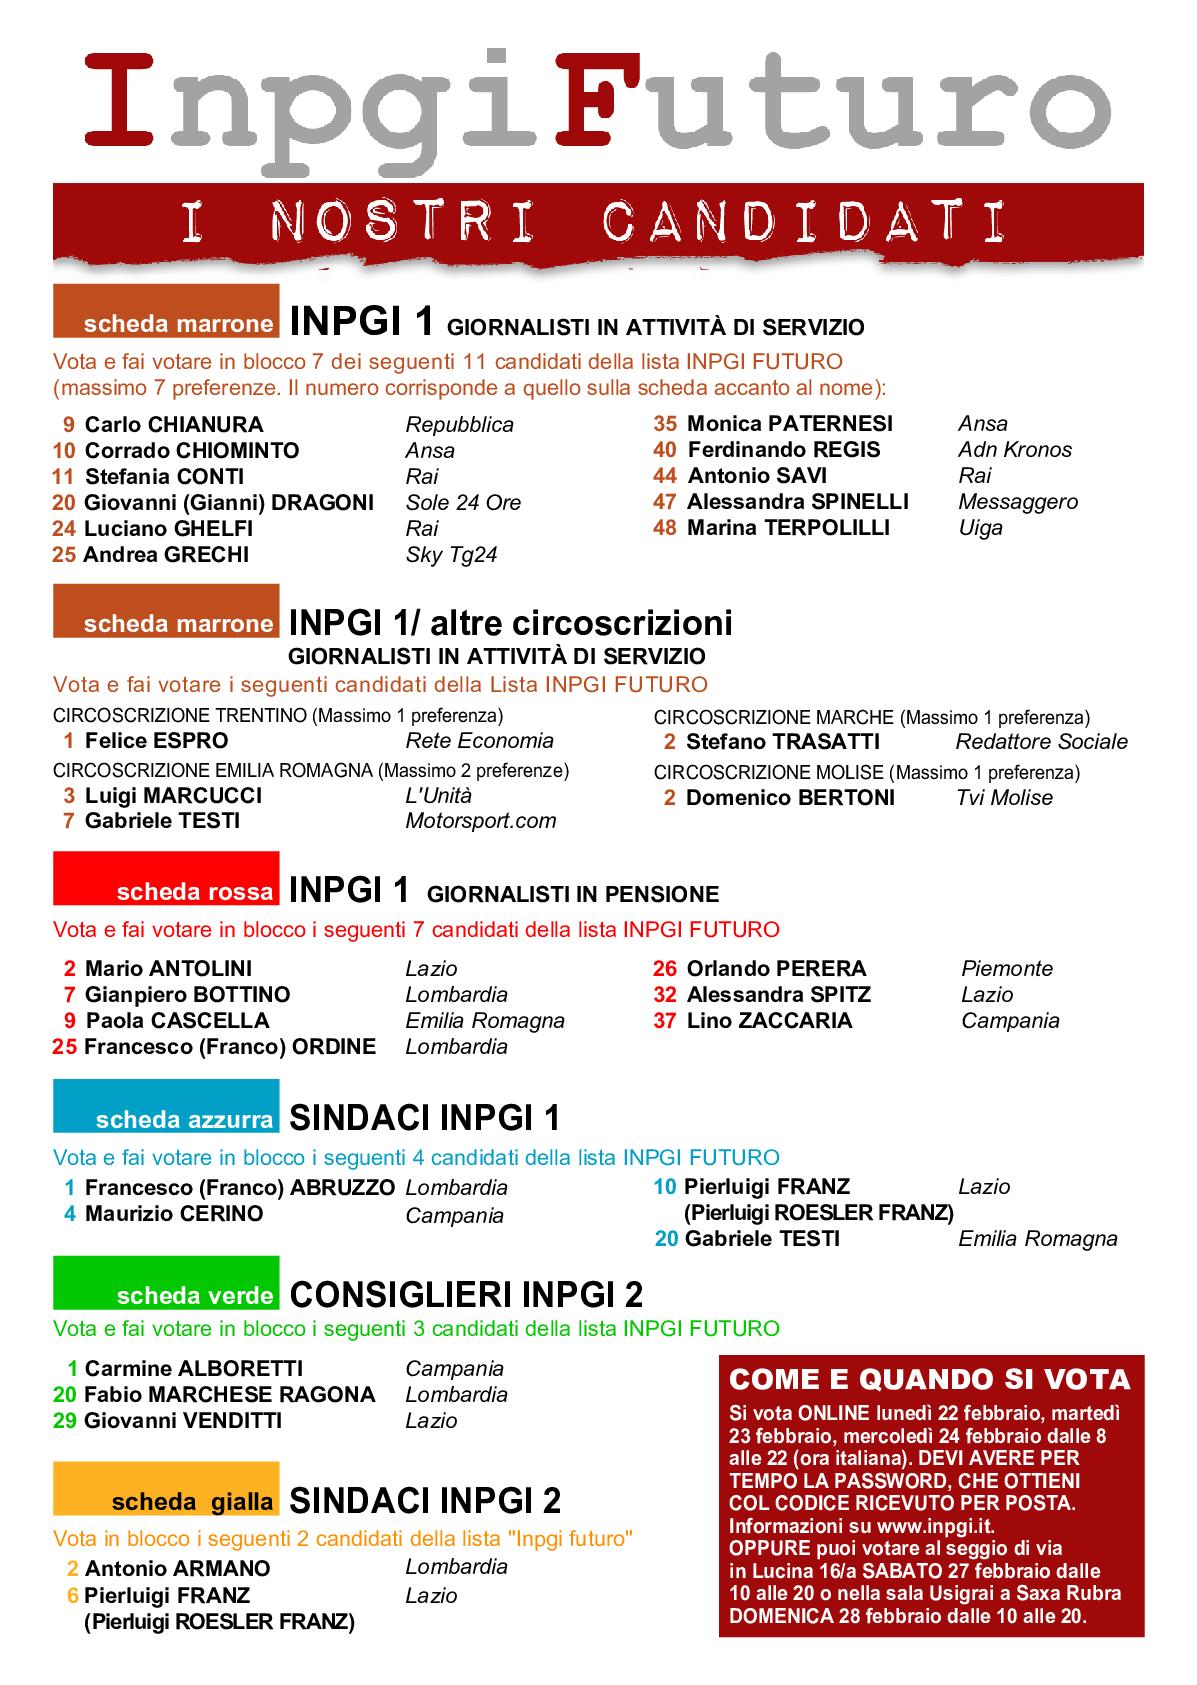 https://www.puntoeacapo.org/images/flyer_corretto_152x214bis.jpg